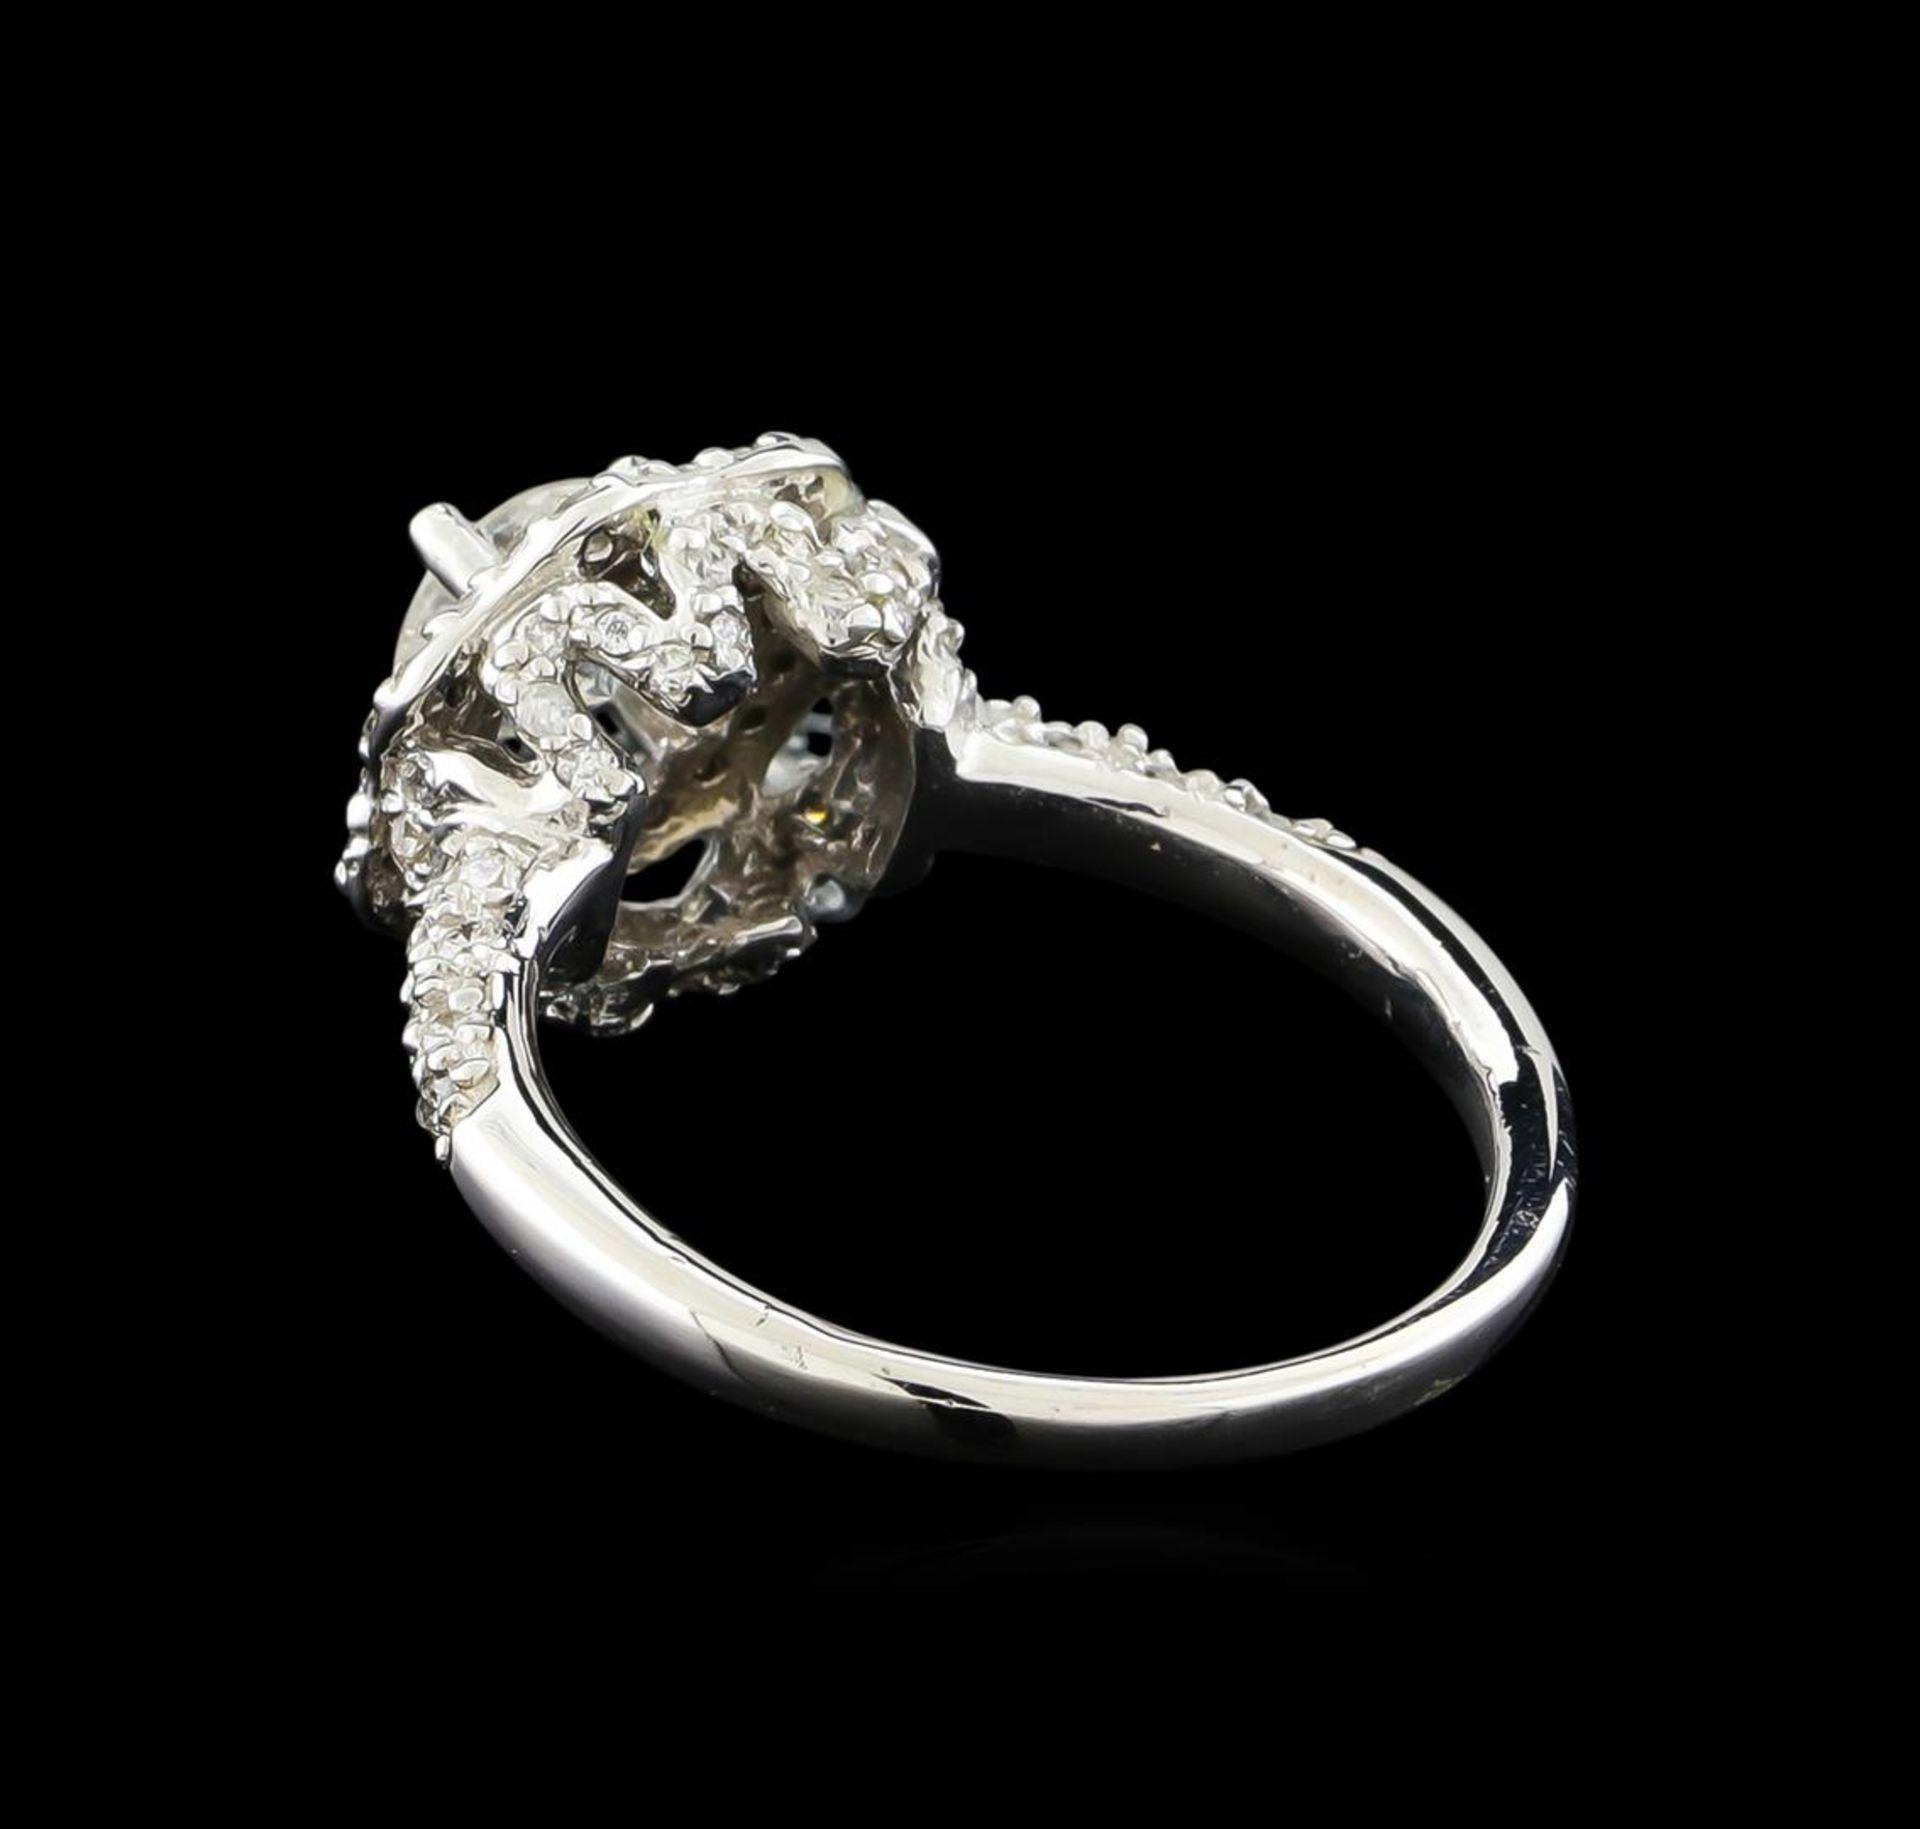 14KT White Gold 0.95 ctw Diamond Ring - Image 3 of 5